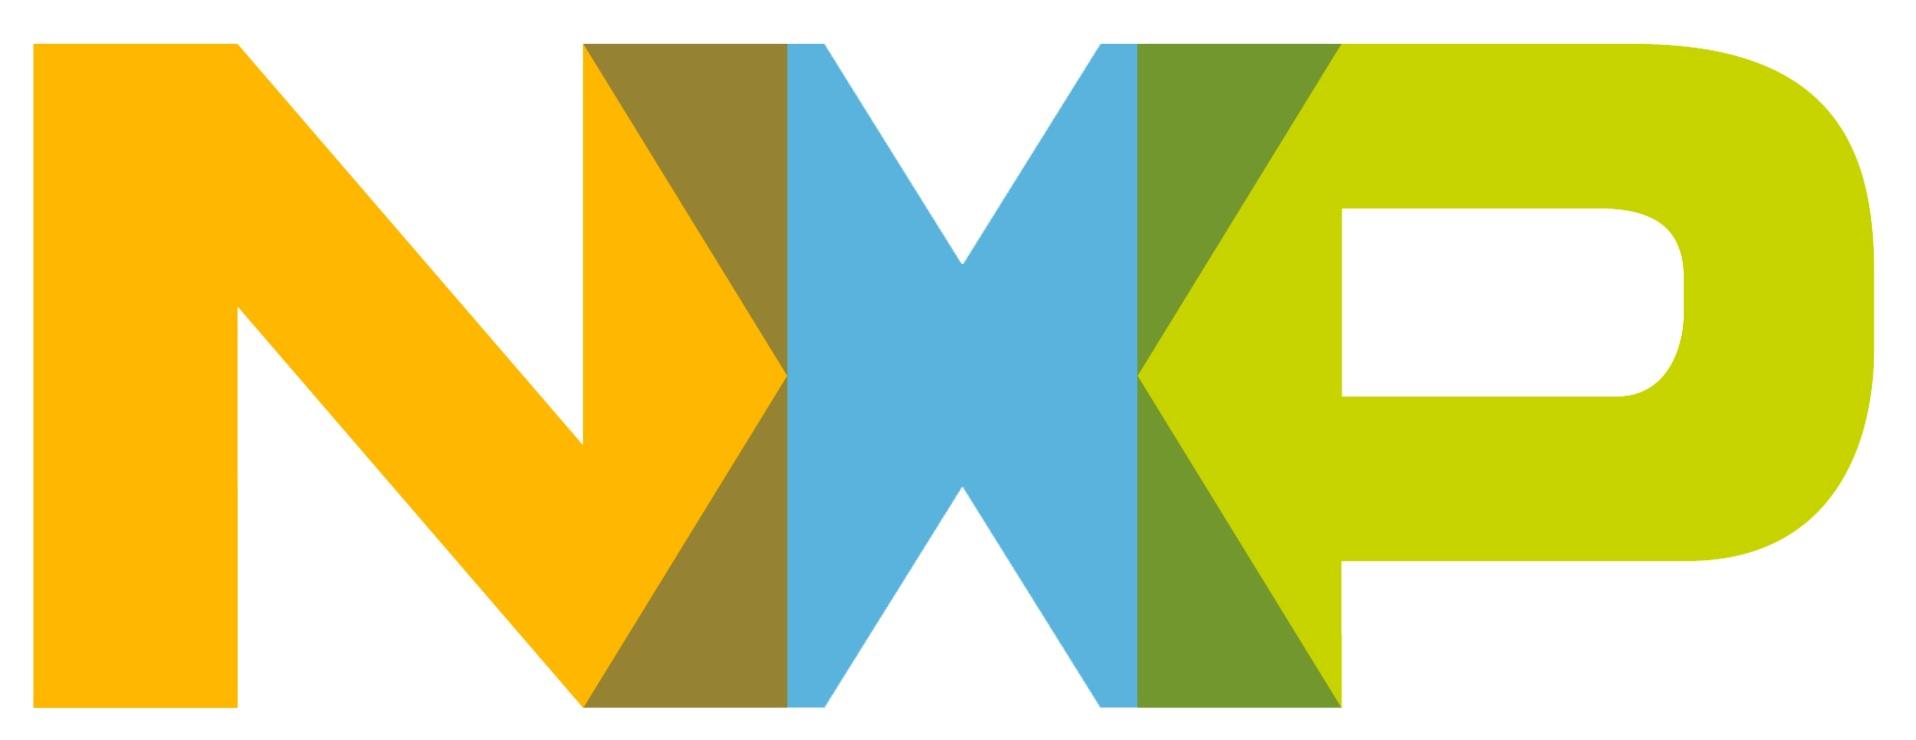 NXP_logo_RGB_web-transp.png